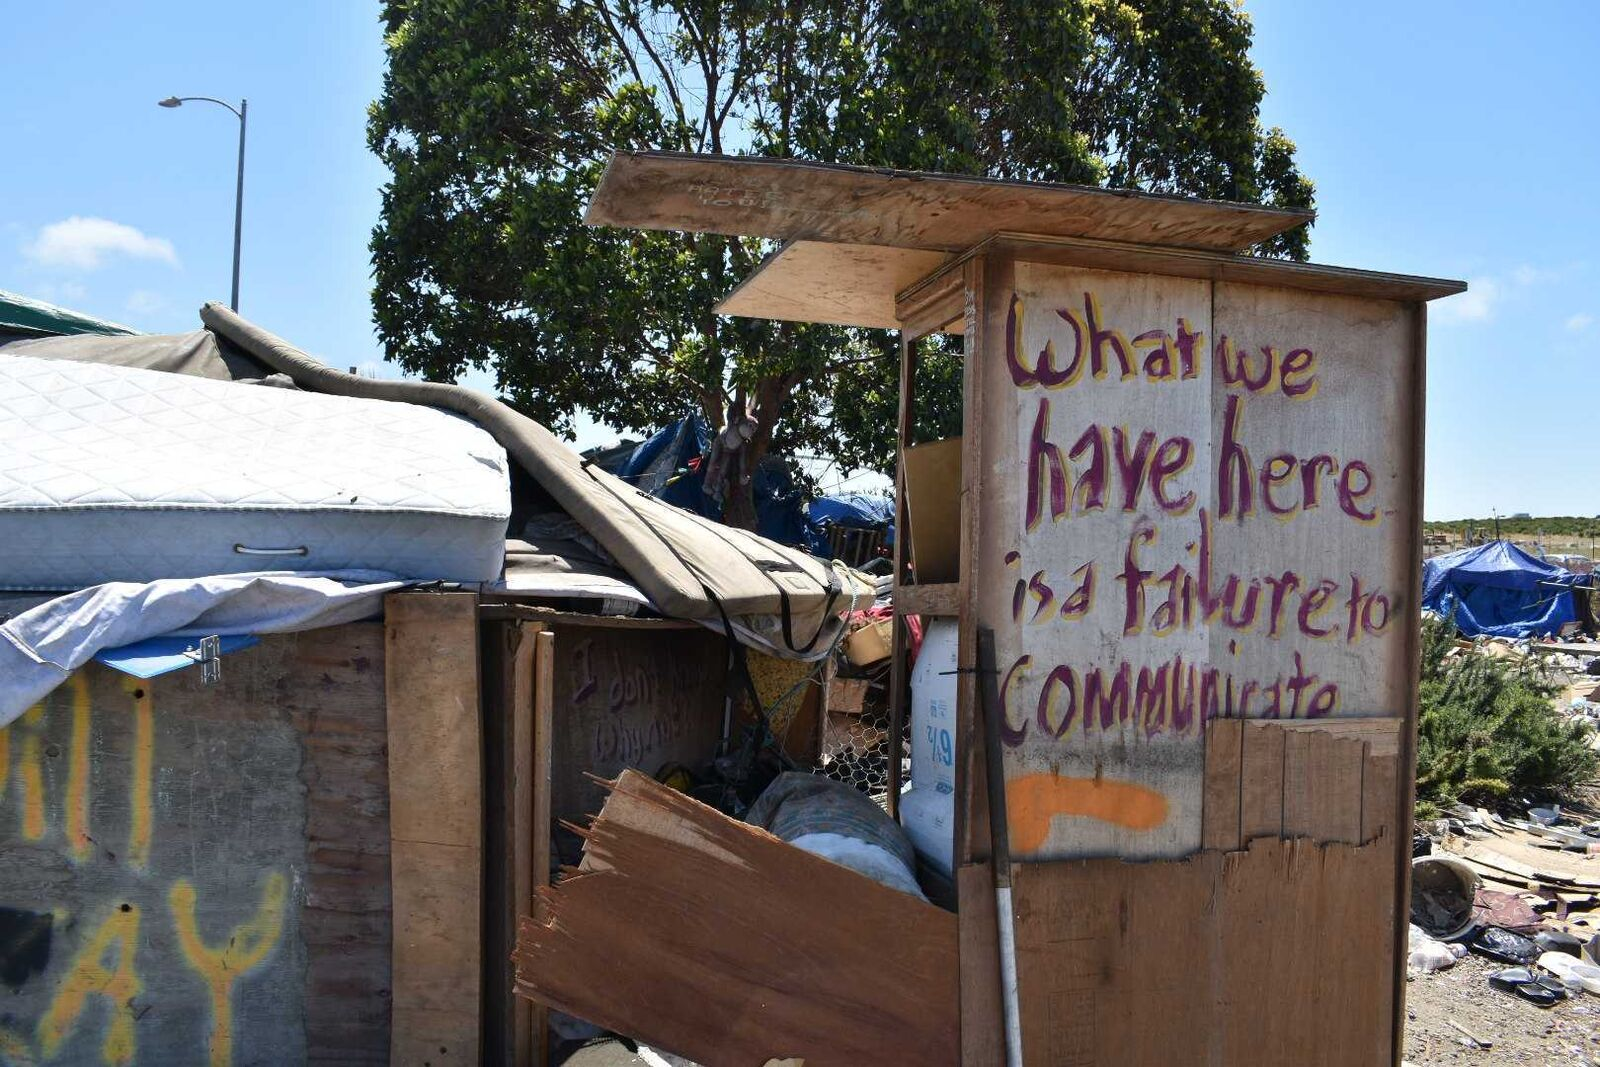 Seabreeze Encampment, July 2, 2021